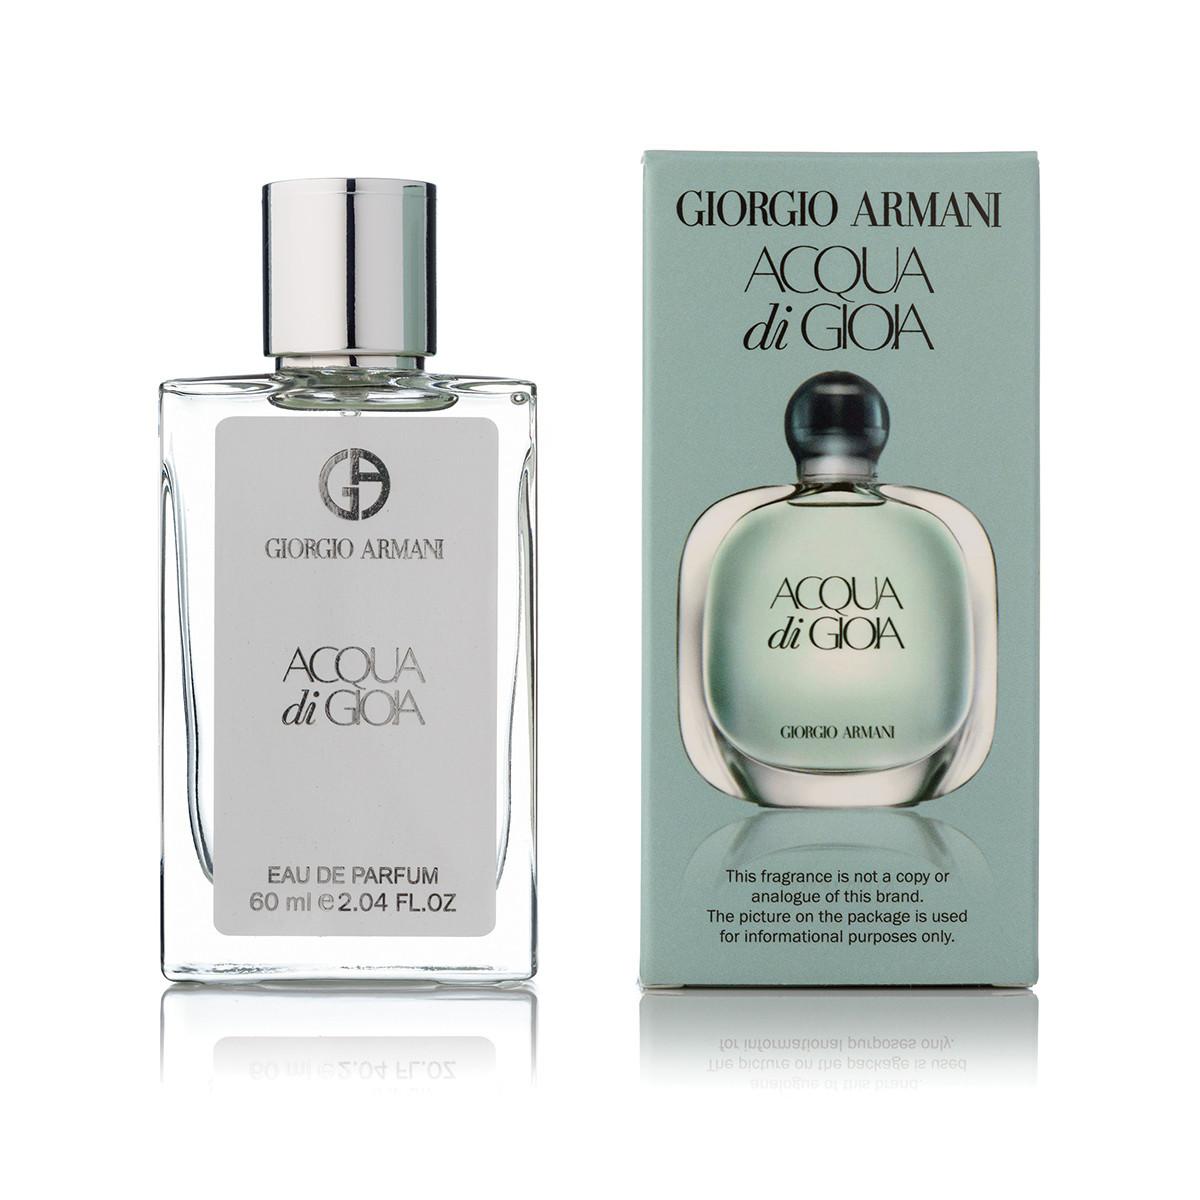 Туалетная вода Acqua di Gioia Giorgio Armani тестер 60 ml (реплика)